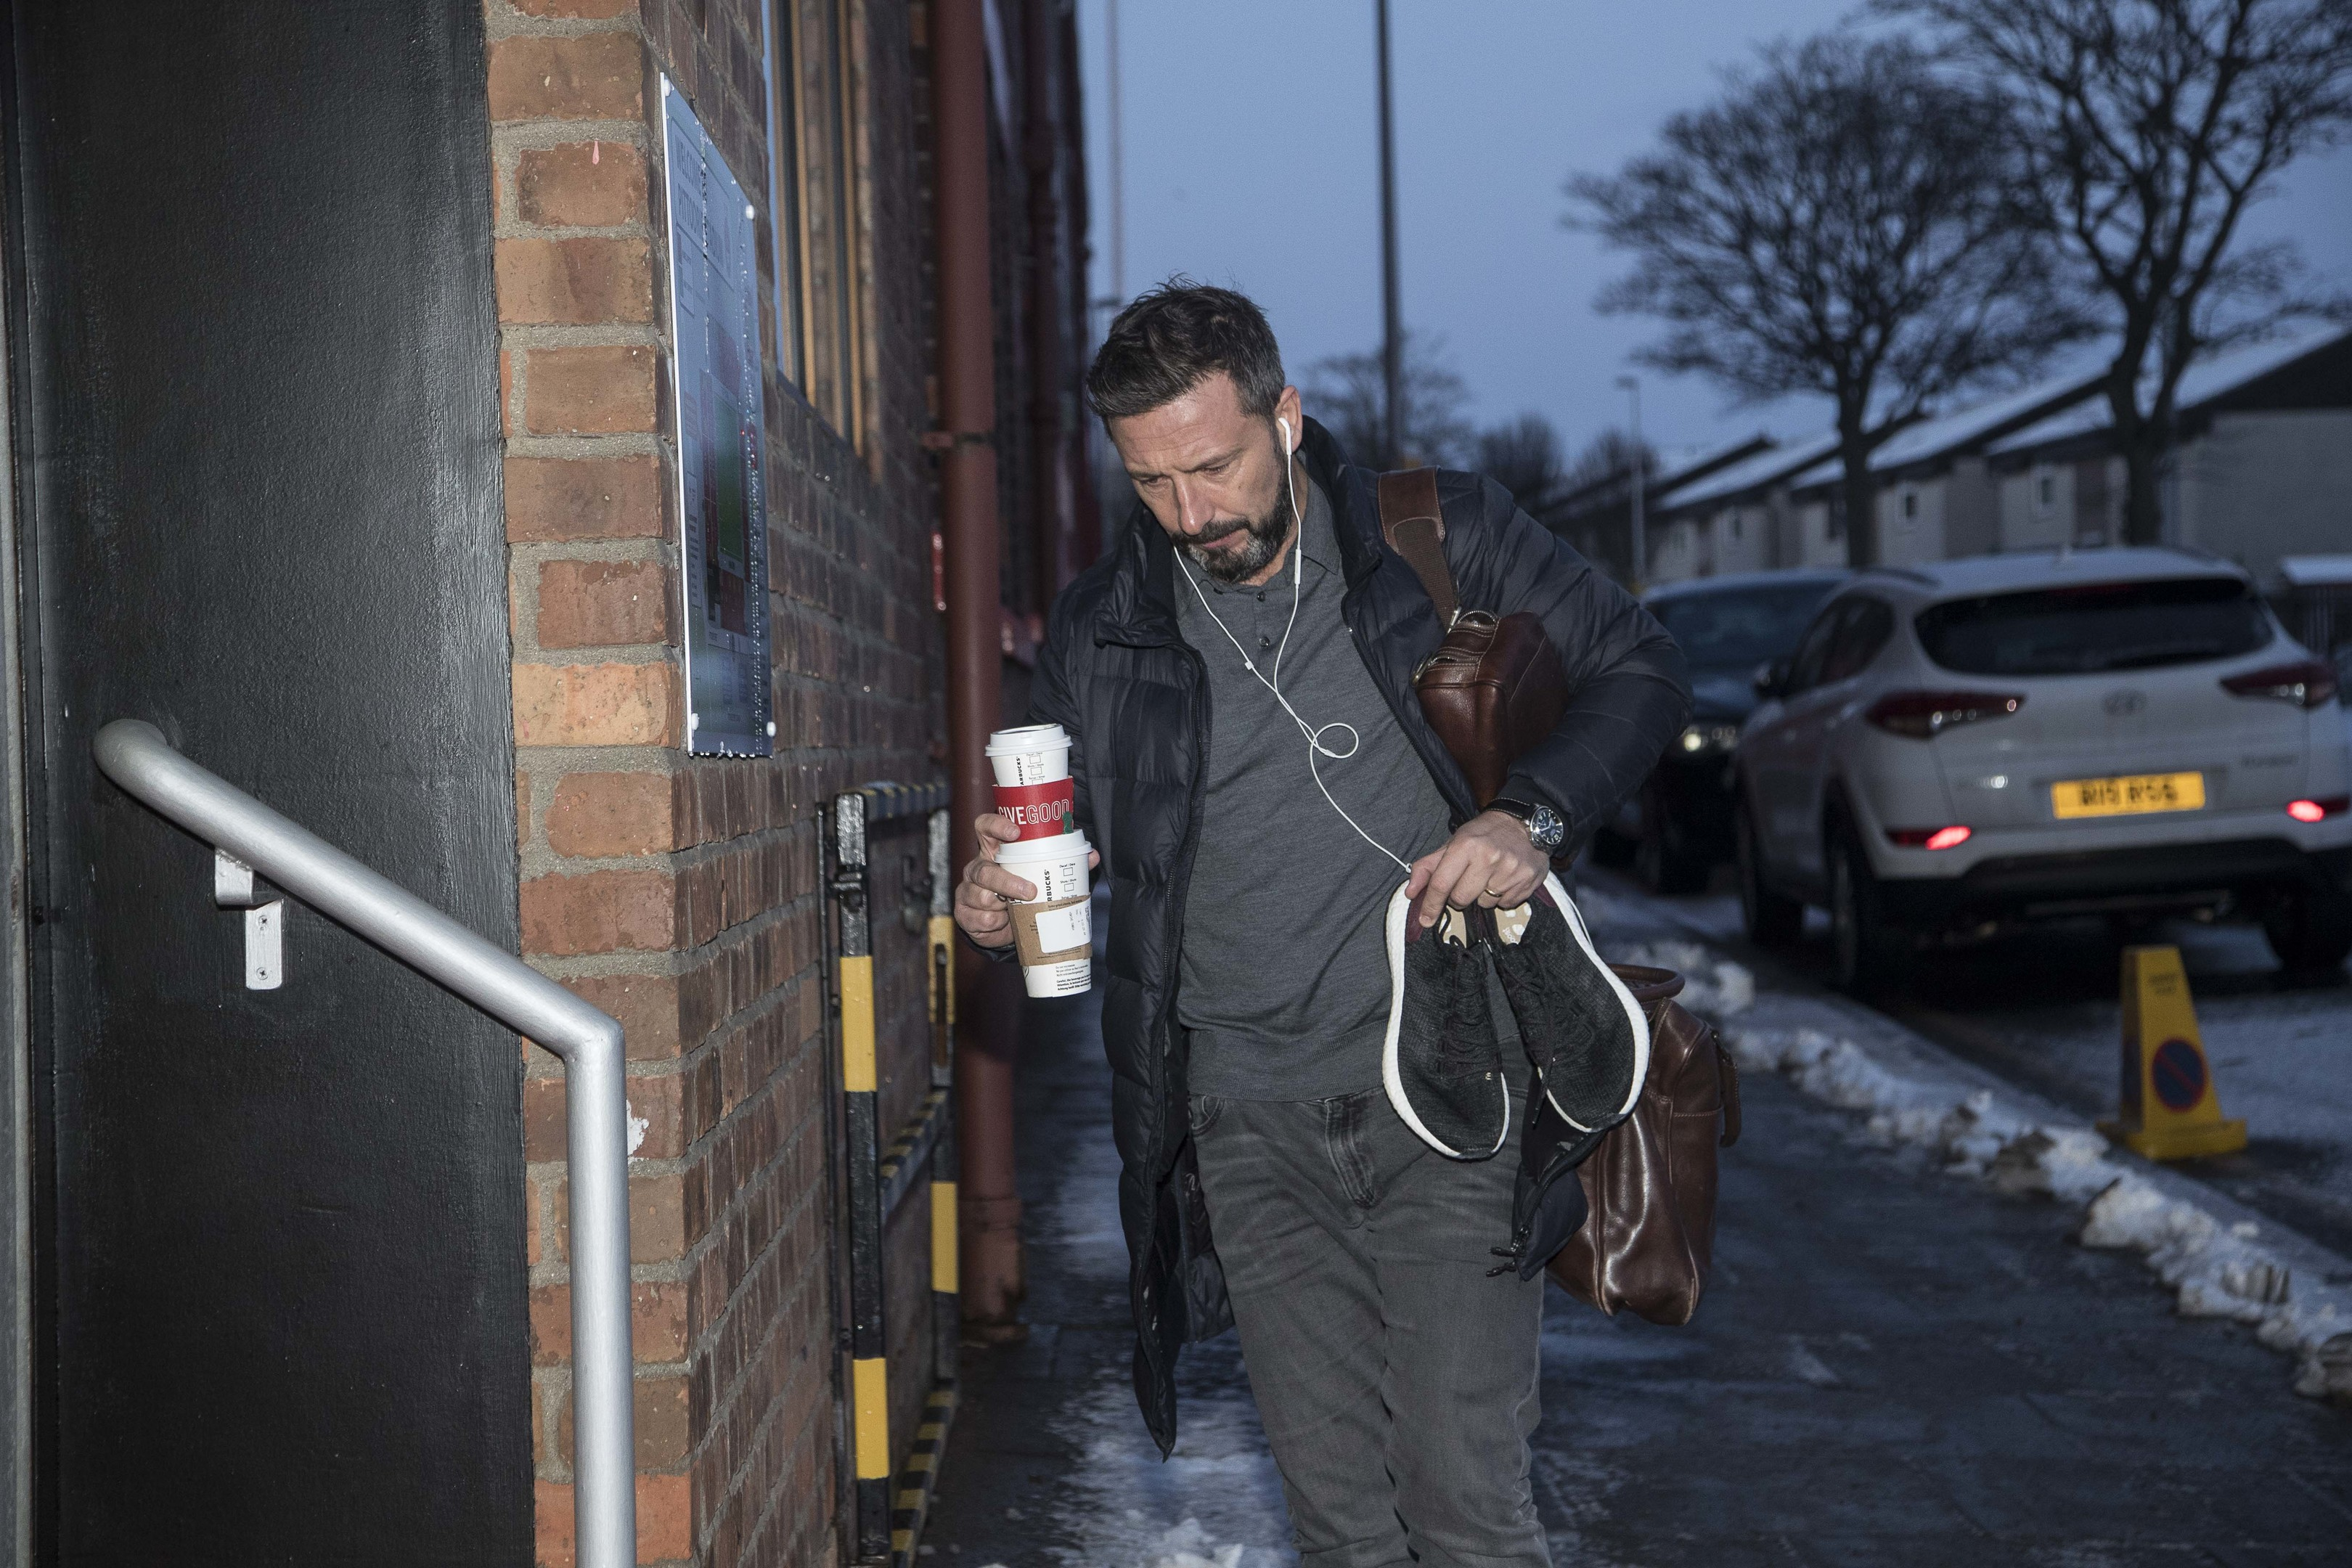 Dons boss Derek McInnes arrived at Pittodrie this morning.